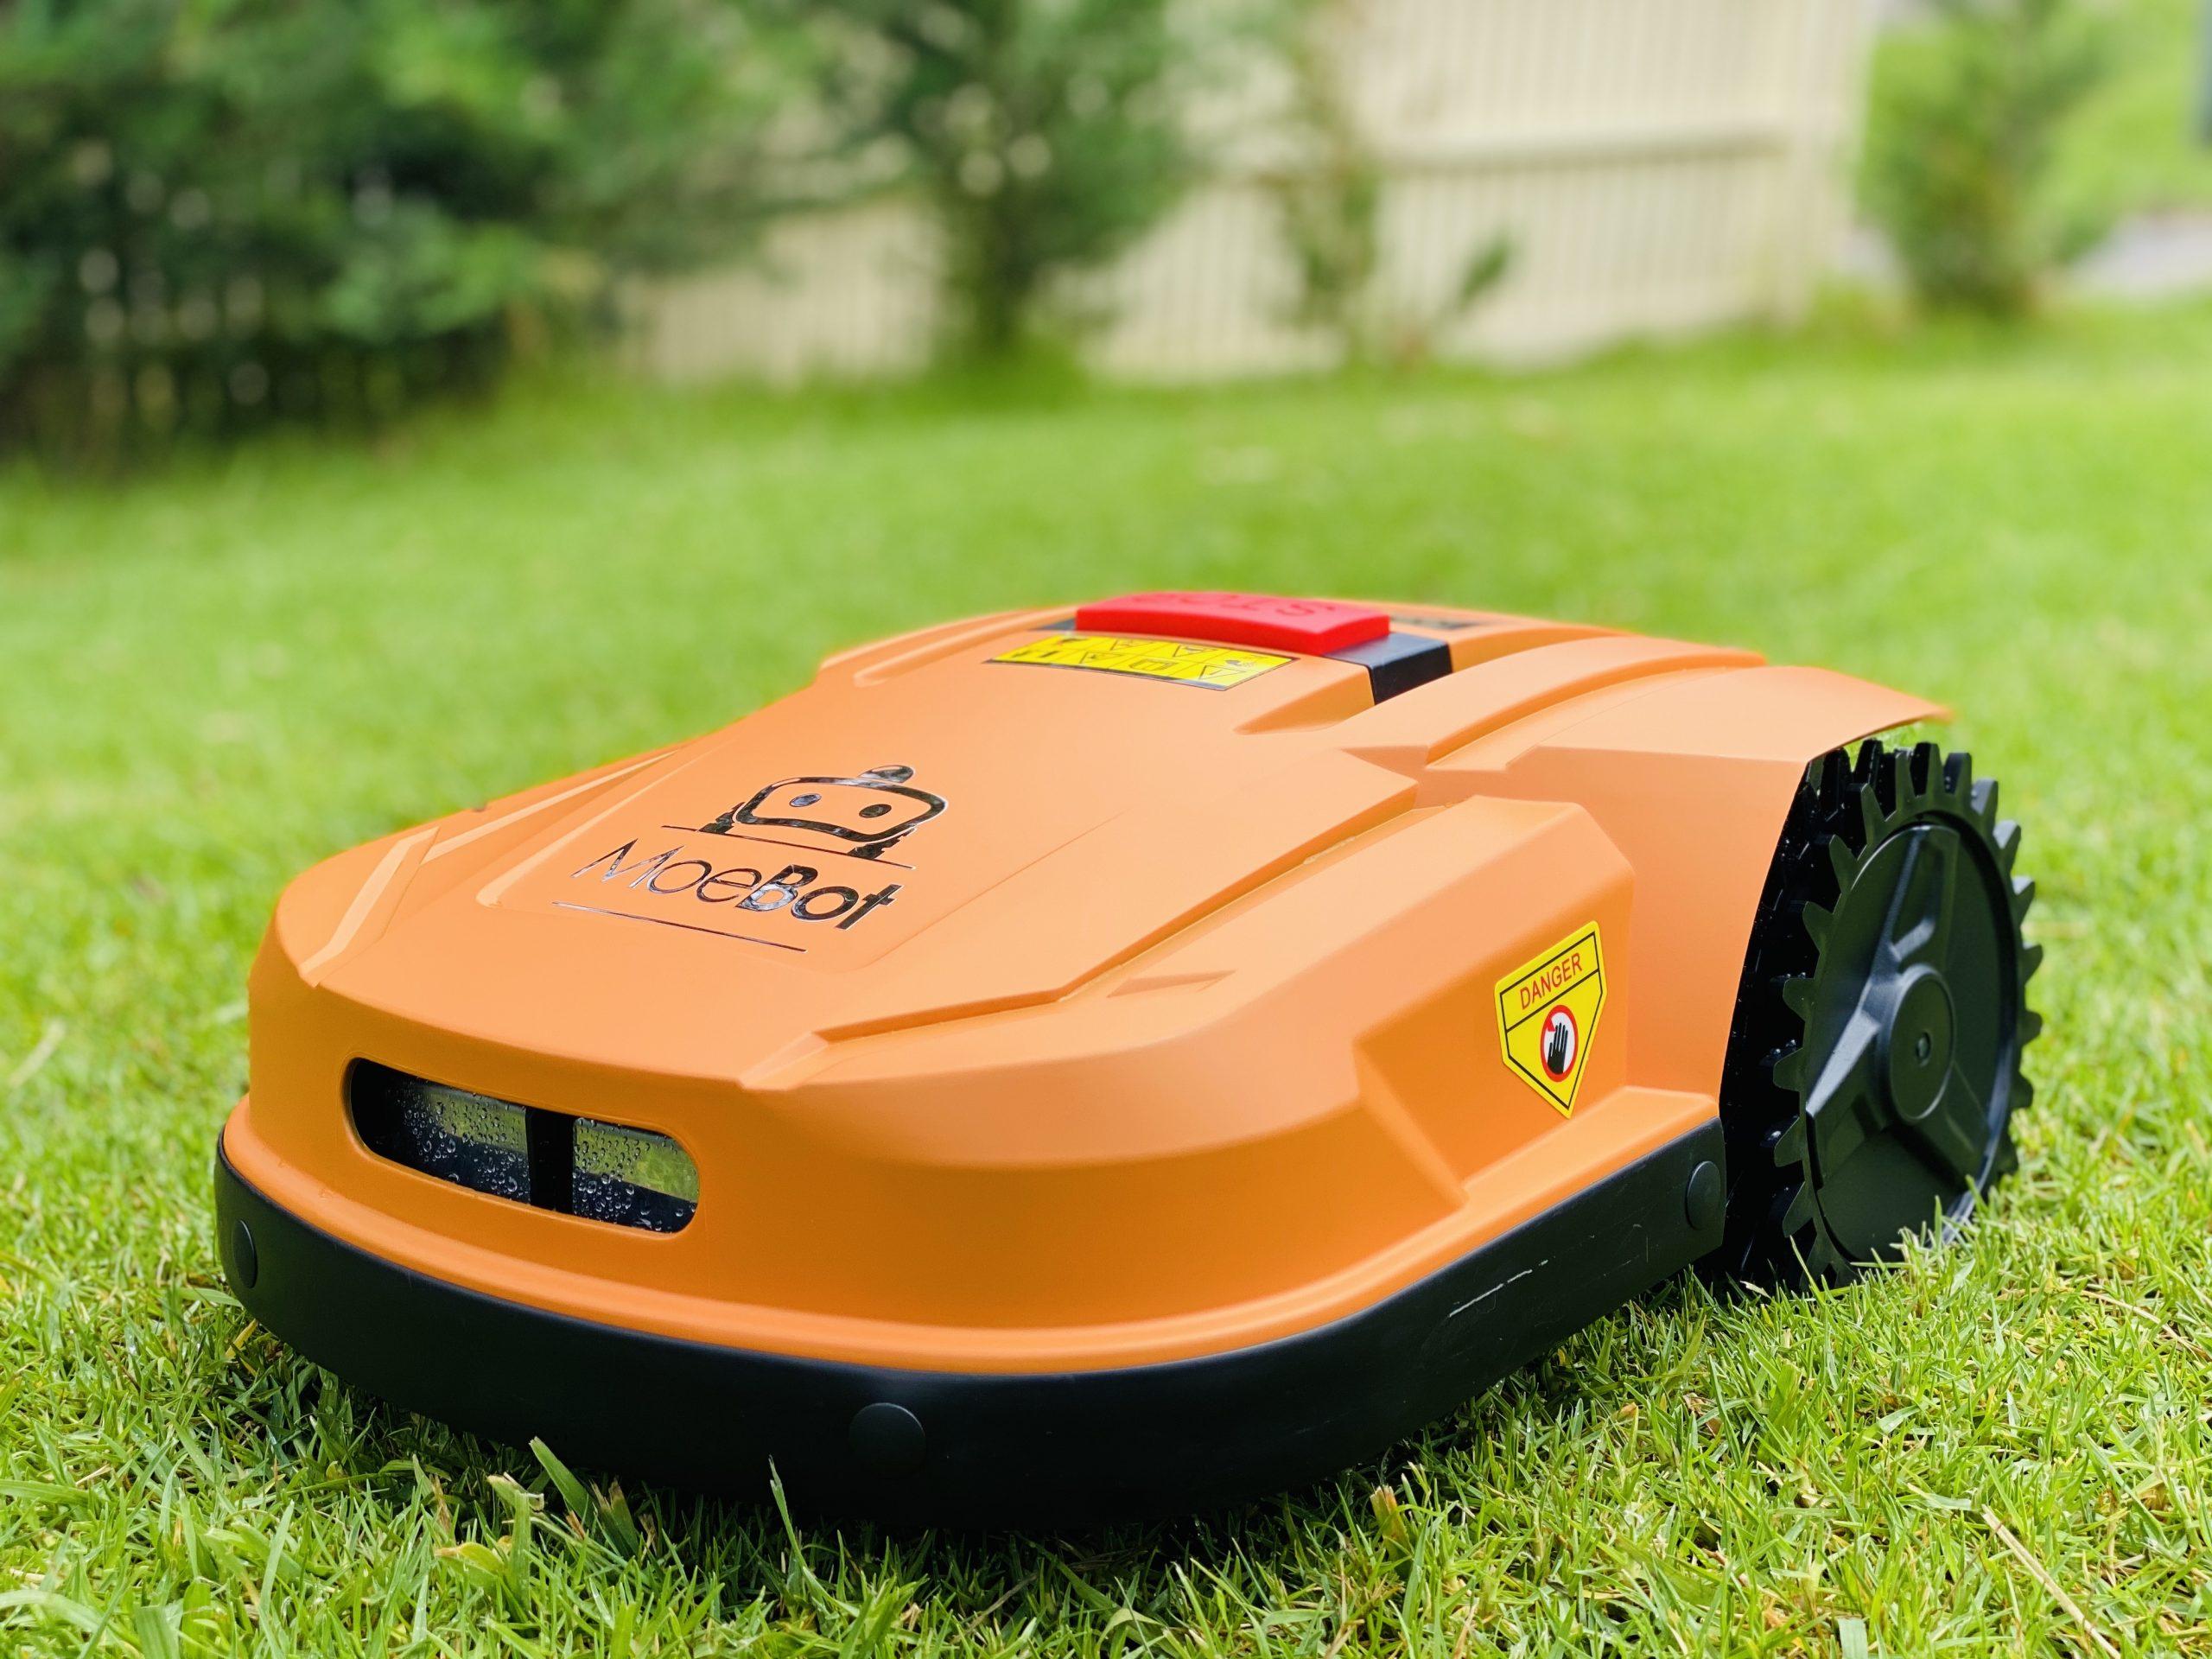 Robot Lawn Mower - Moebot Works